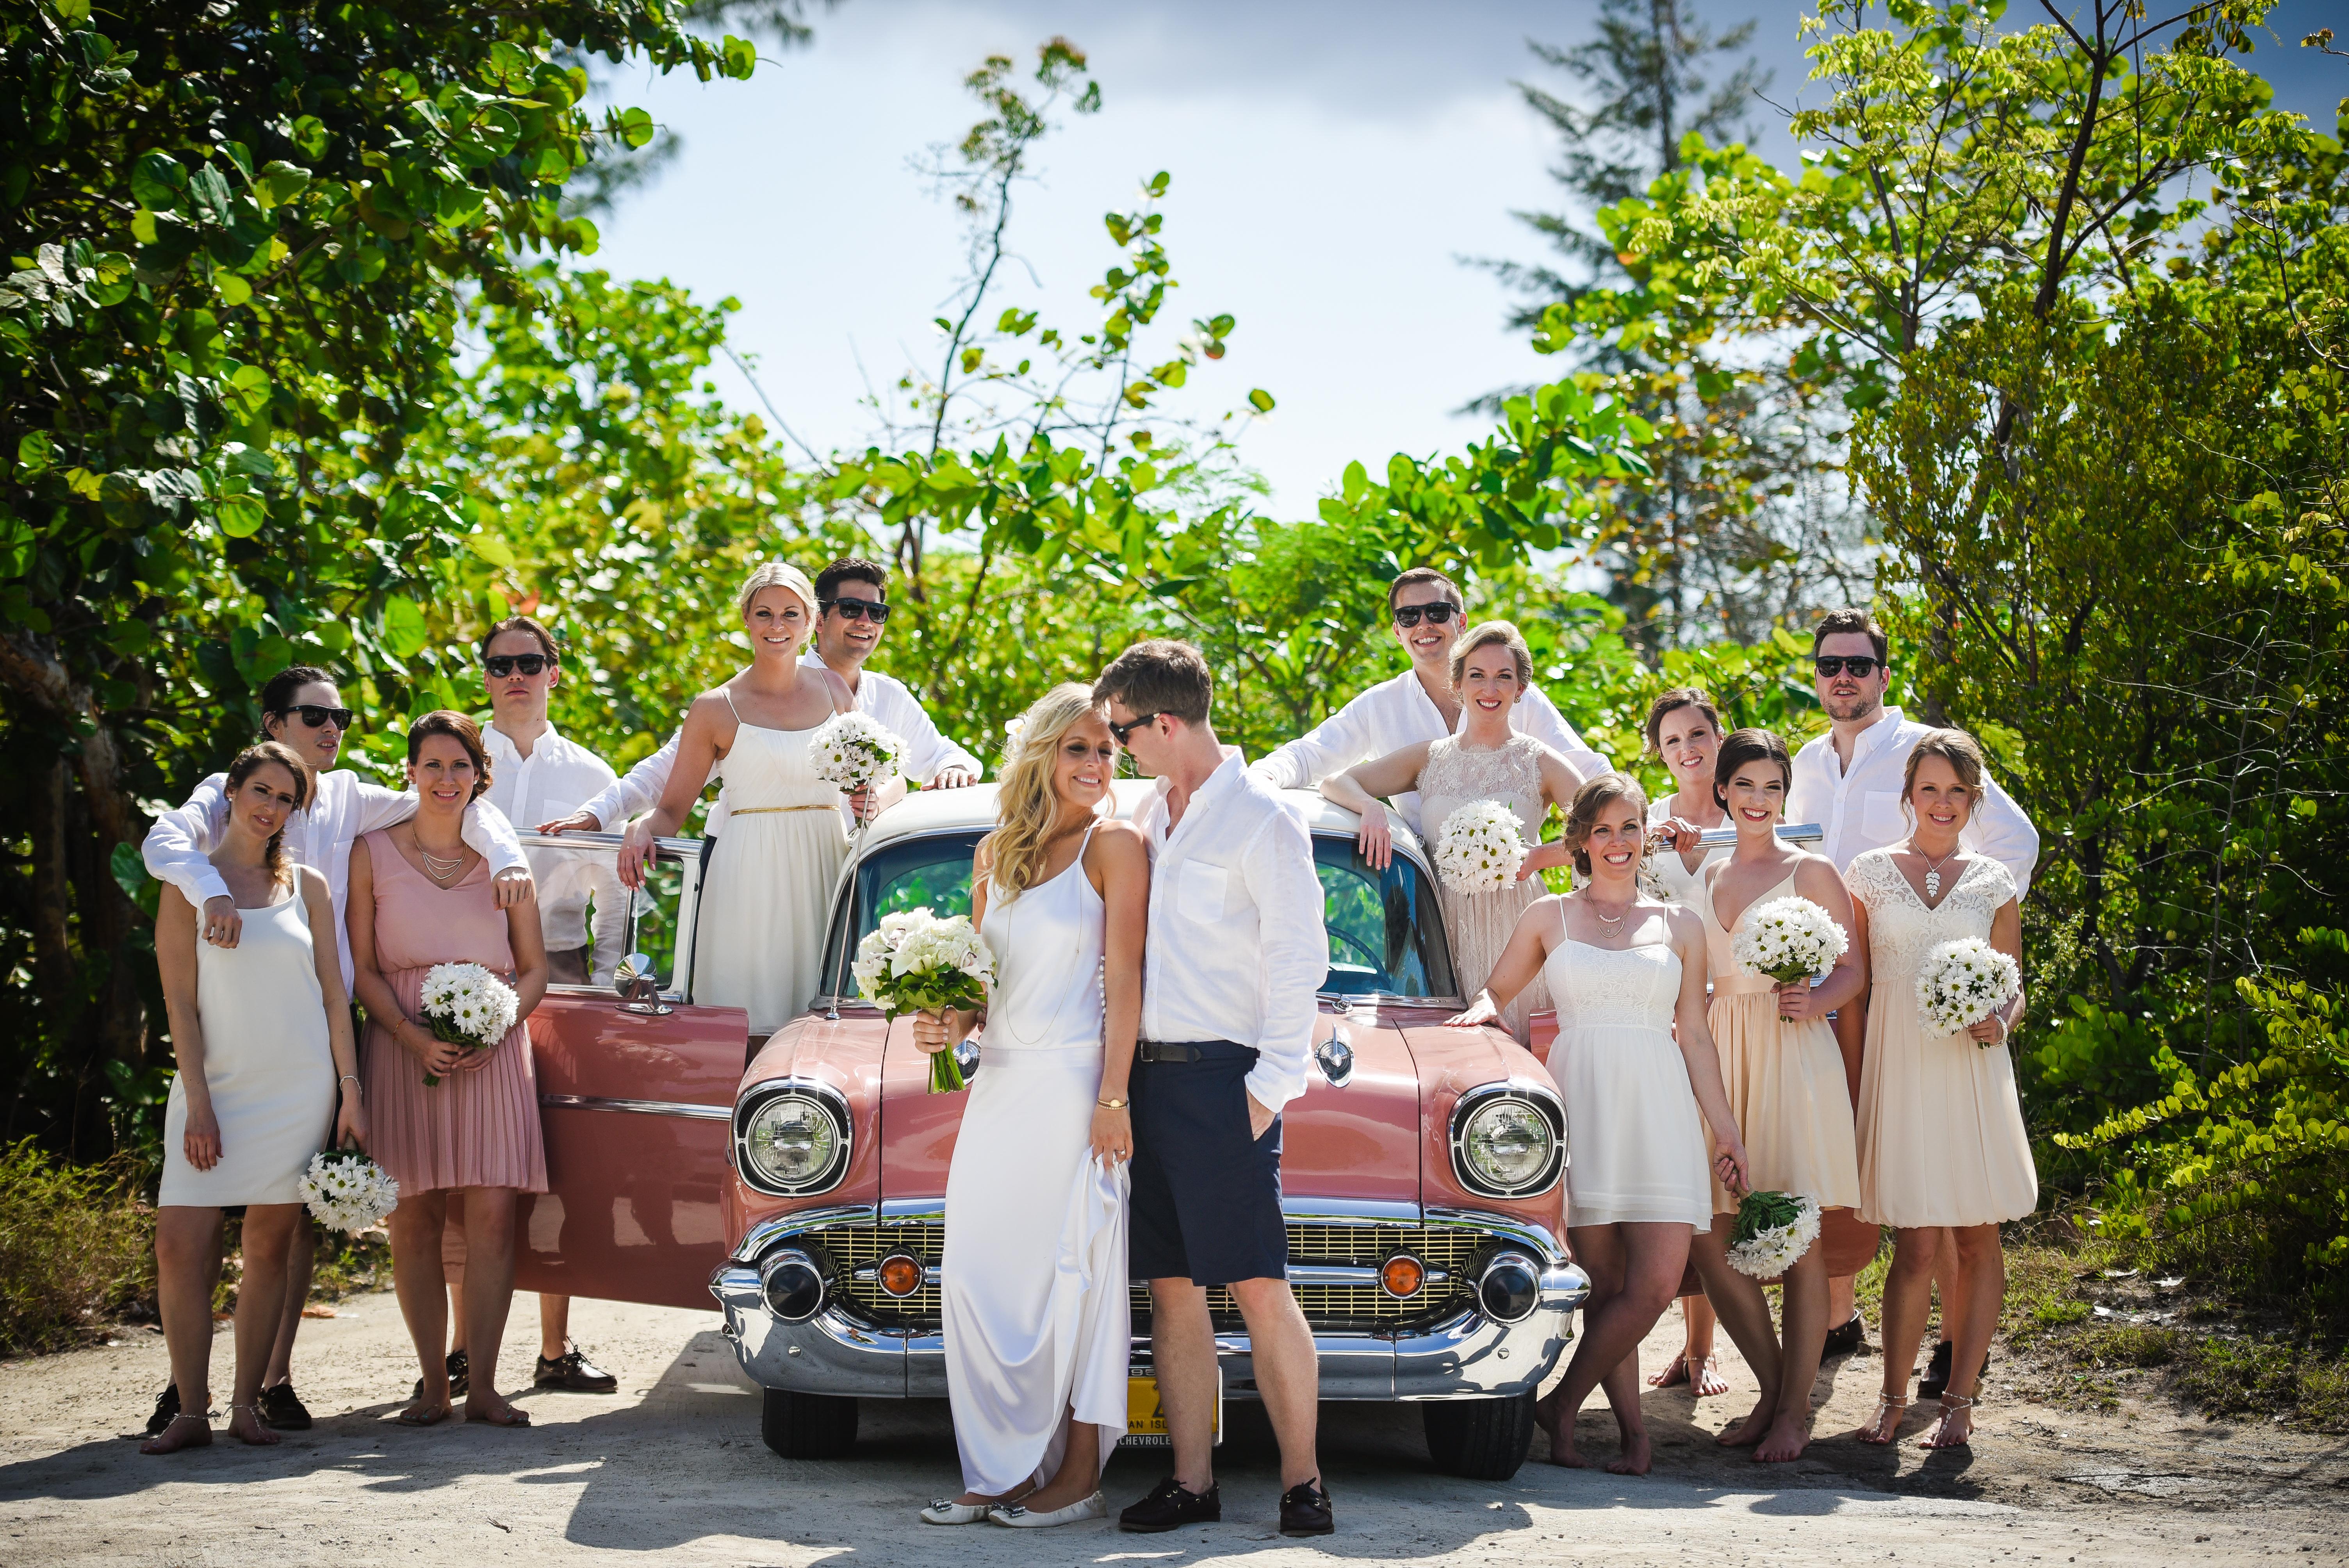 Bridal Car Fun Image